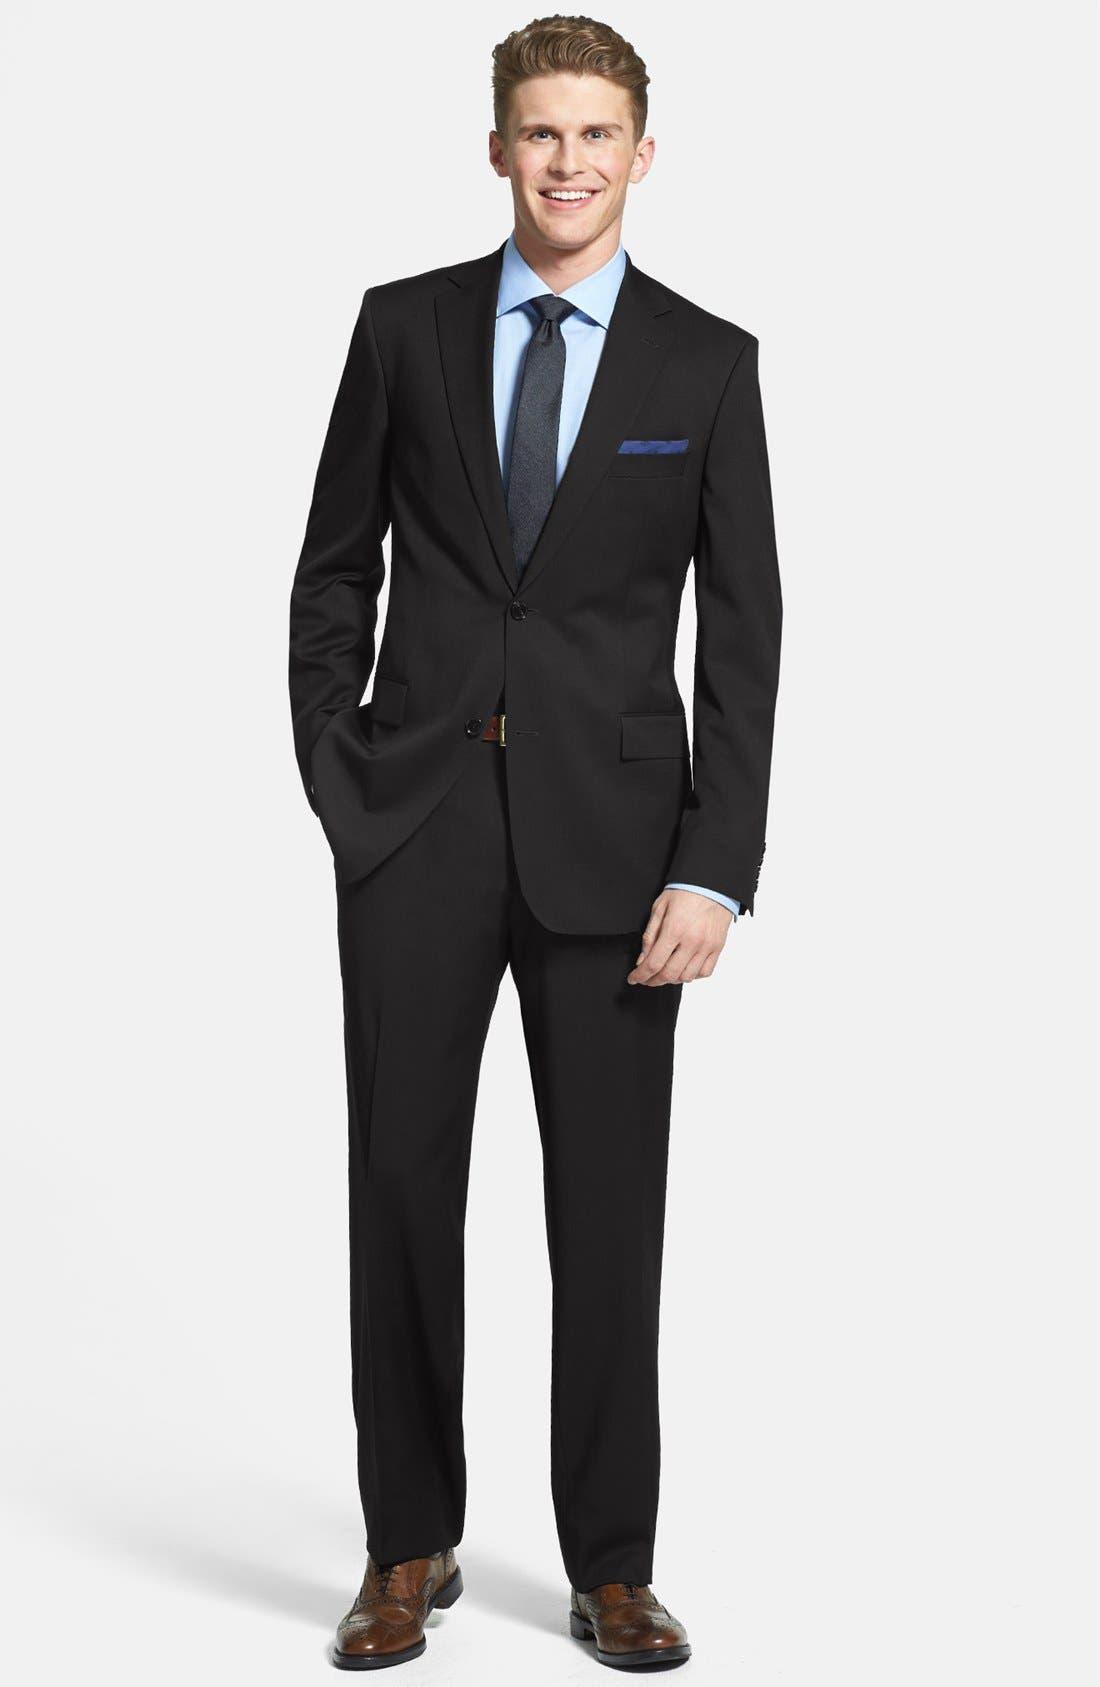 Alternate Image 1 Selected - BOSS HUGO BOSS 'Pasolini/Movie' Wool Suit